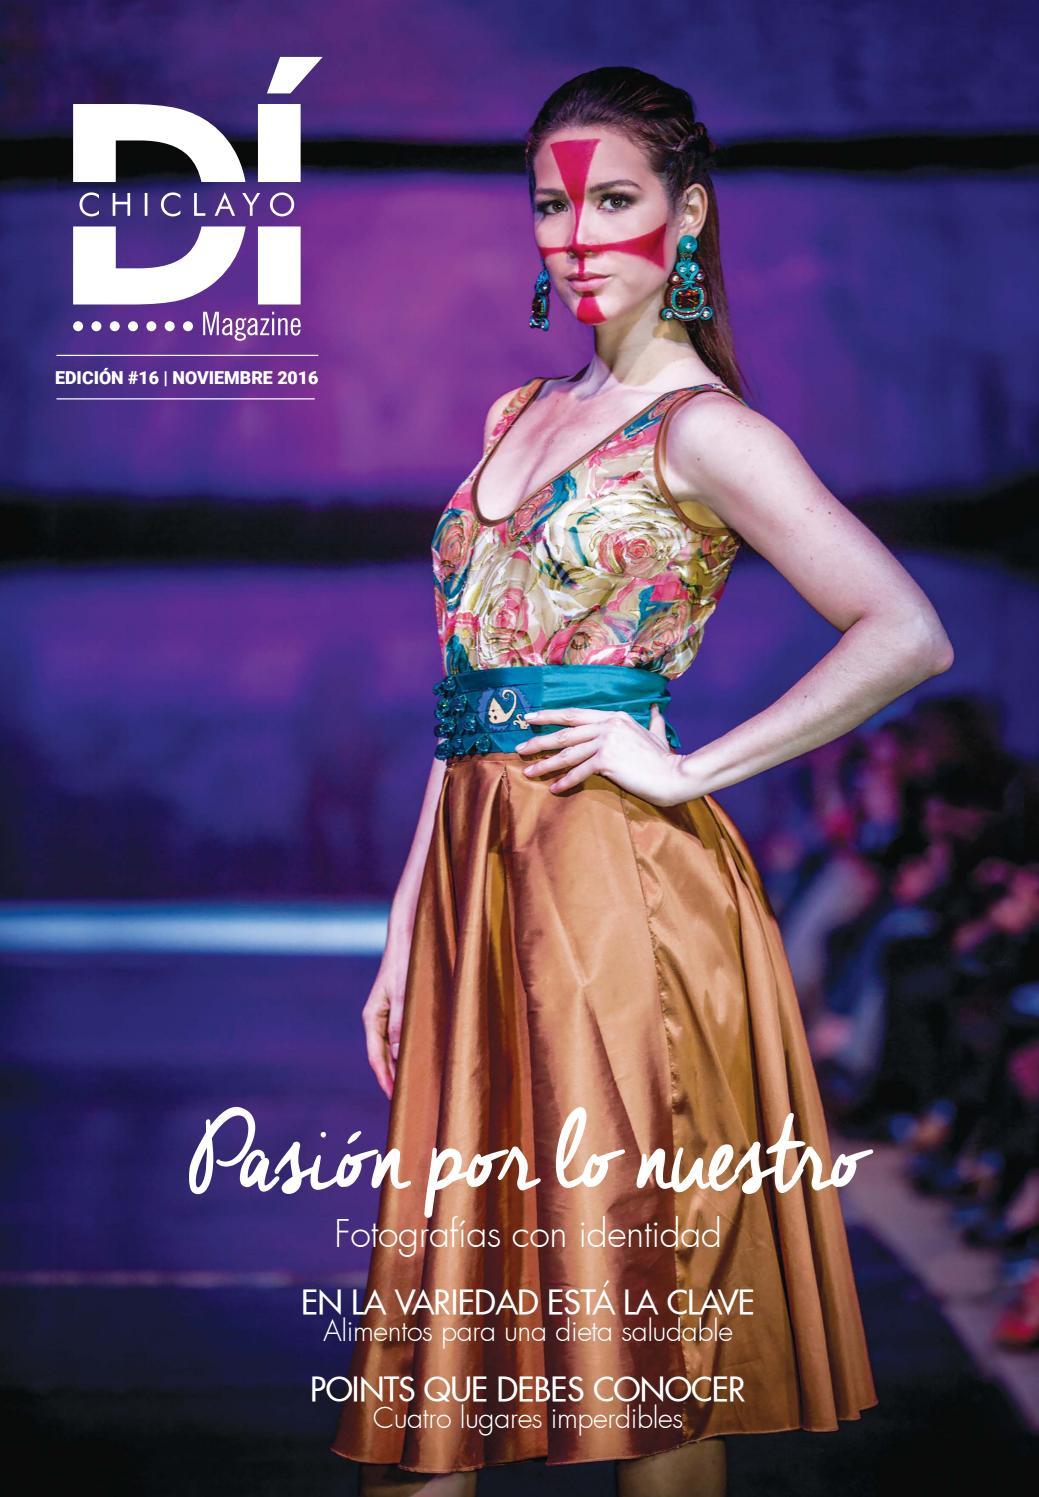 Di Chiclayo Magazine: Edición #16 by Di Chiclayo Magazine - issuu